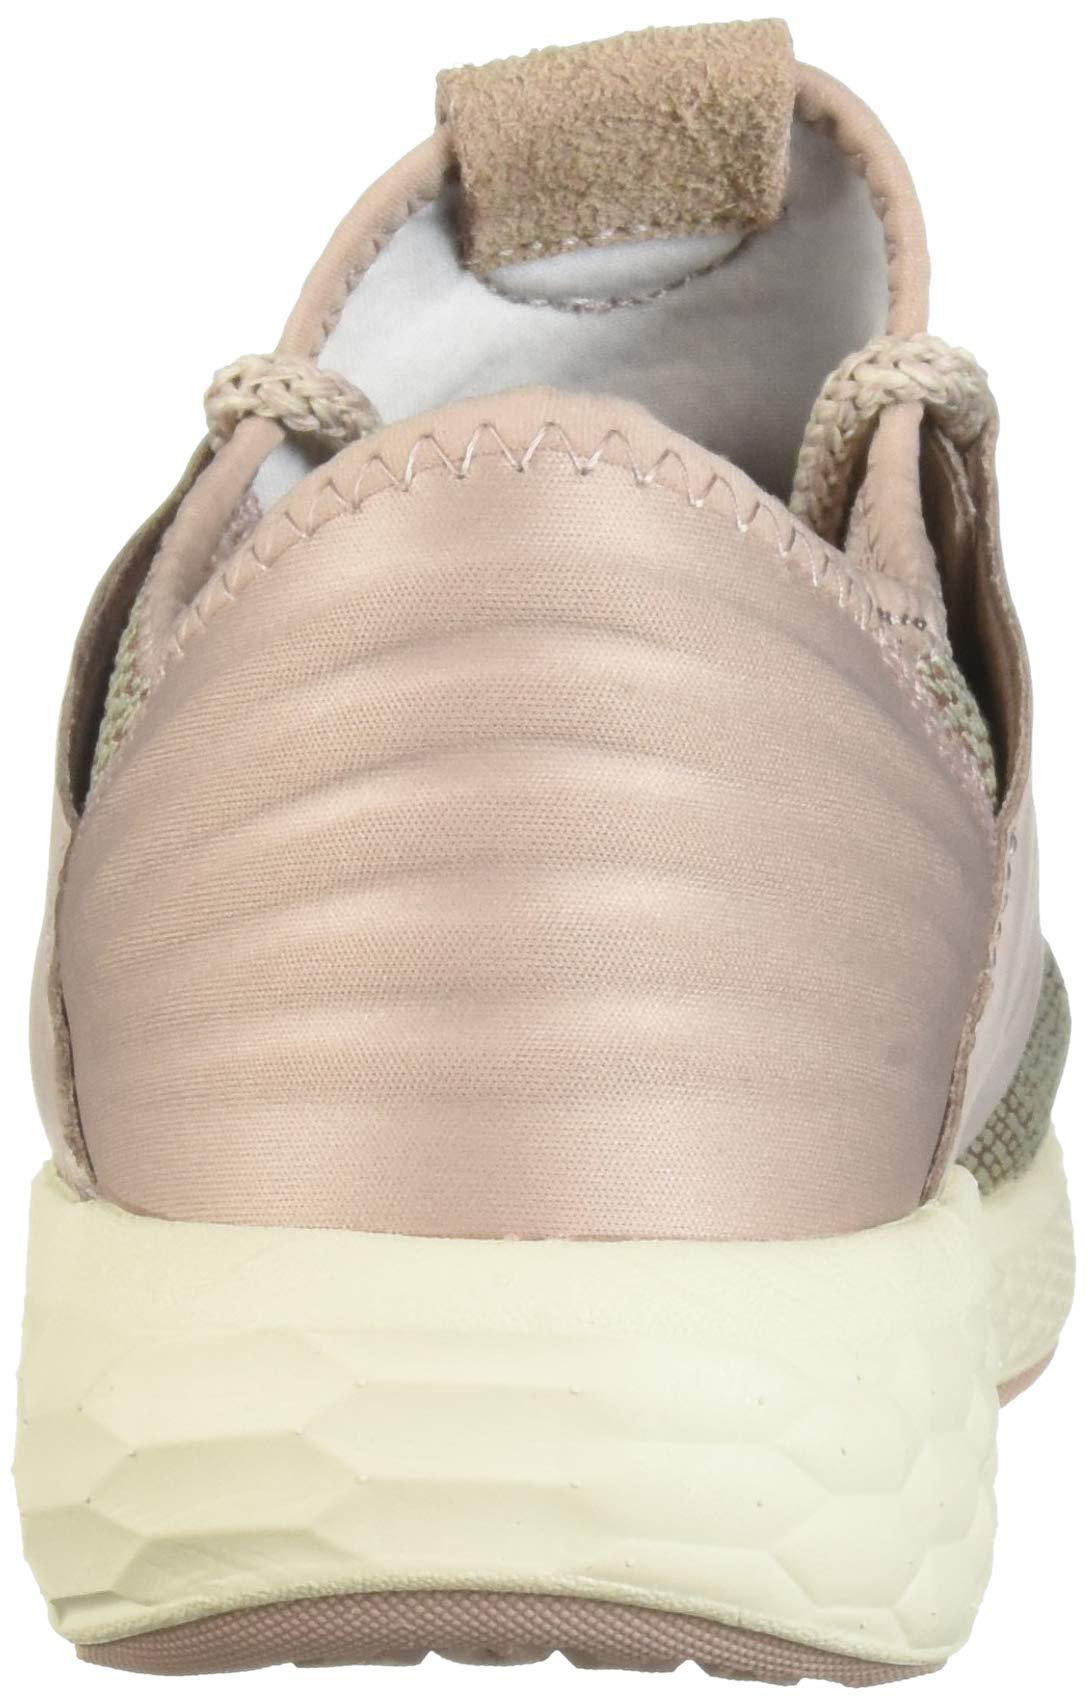 New Balance Women's Cruz V2 Fresh Foam Running Shoe Faded Birch/au Lait/Alabaster 5 B US by New Balance (Image #2)